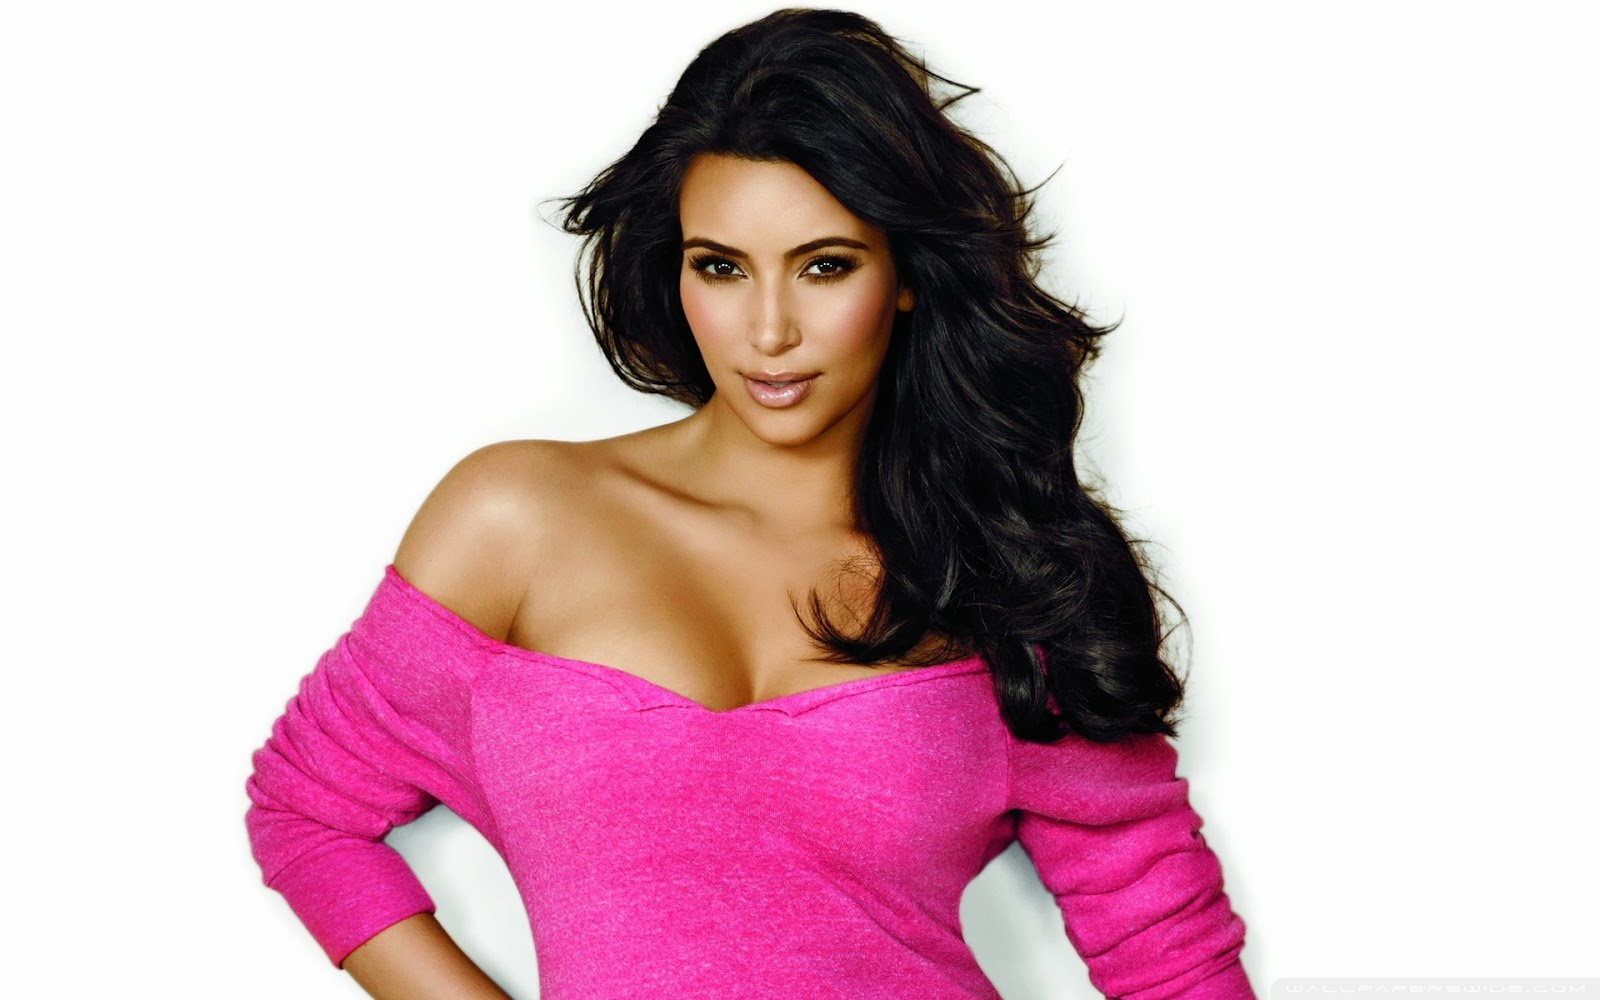 Kim Kardashian Nude Pics Hd